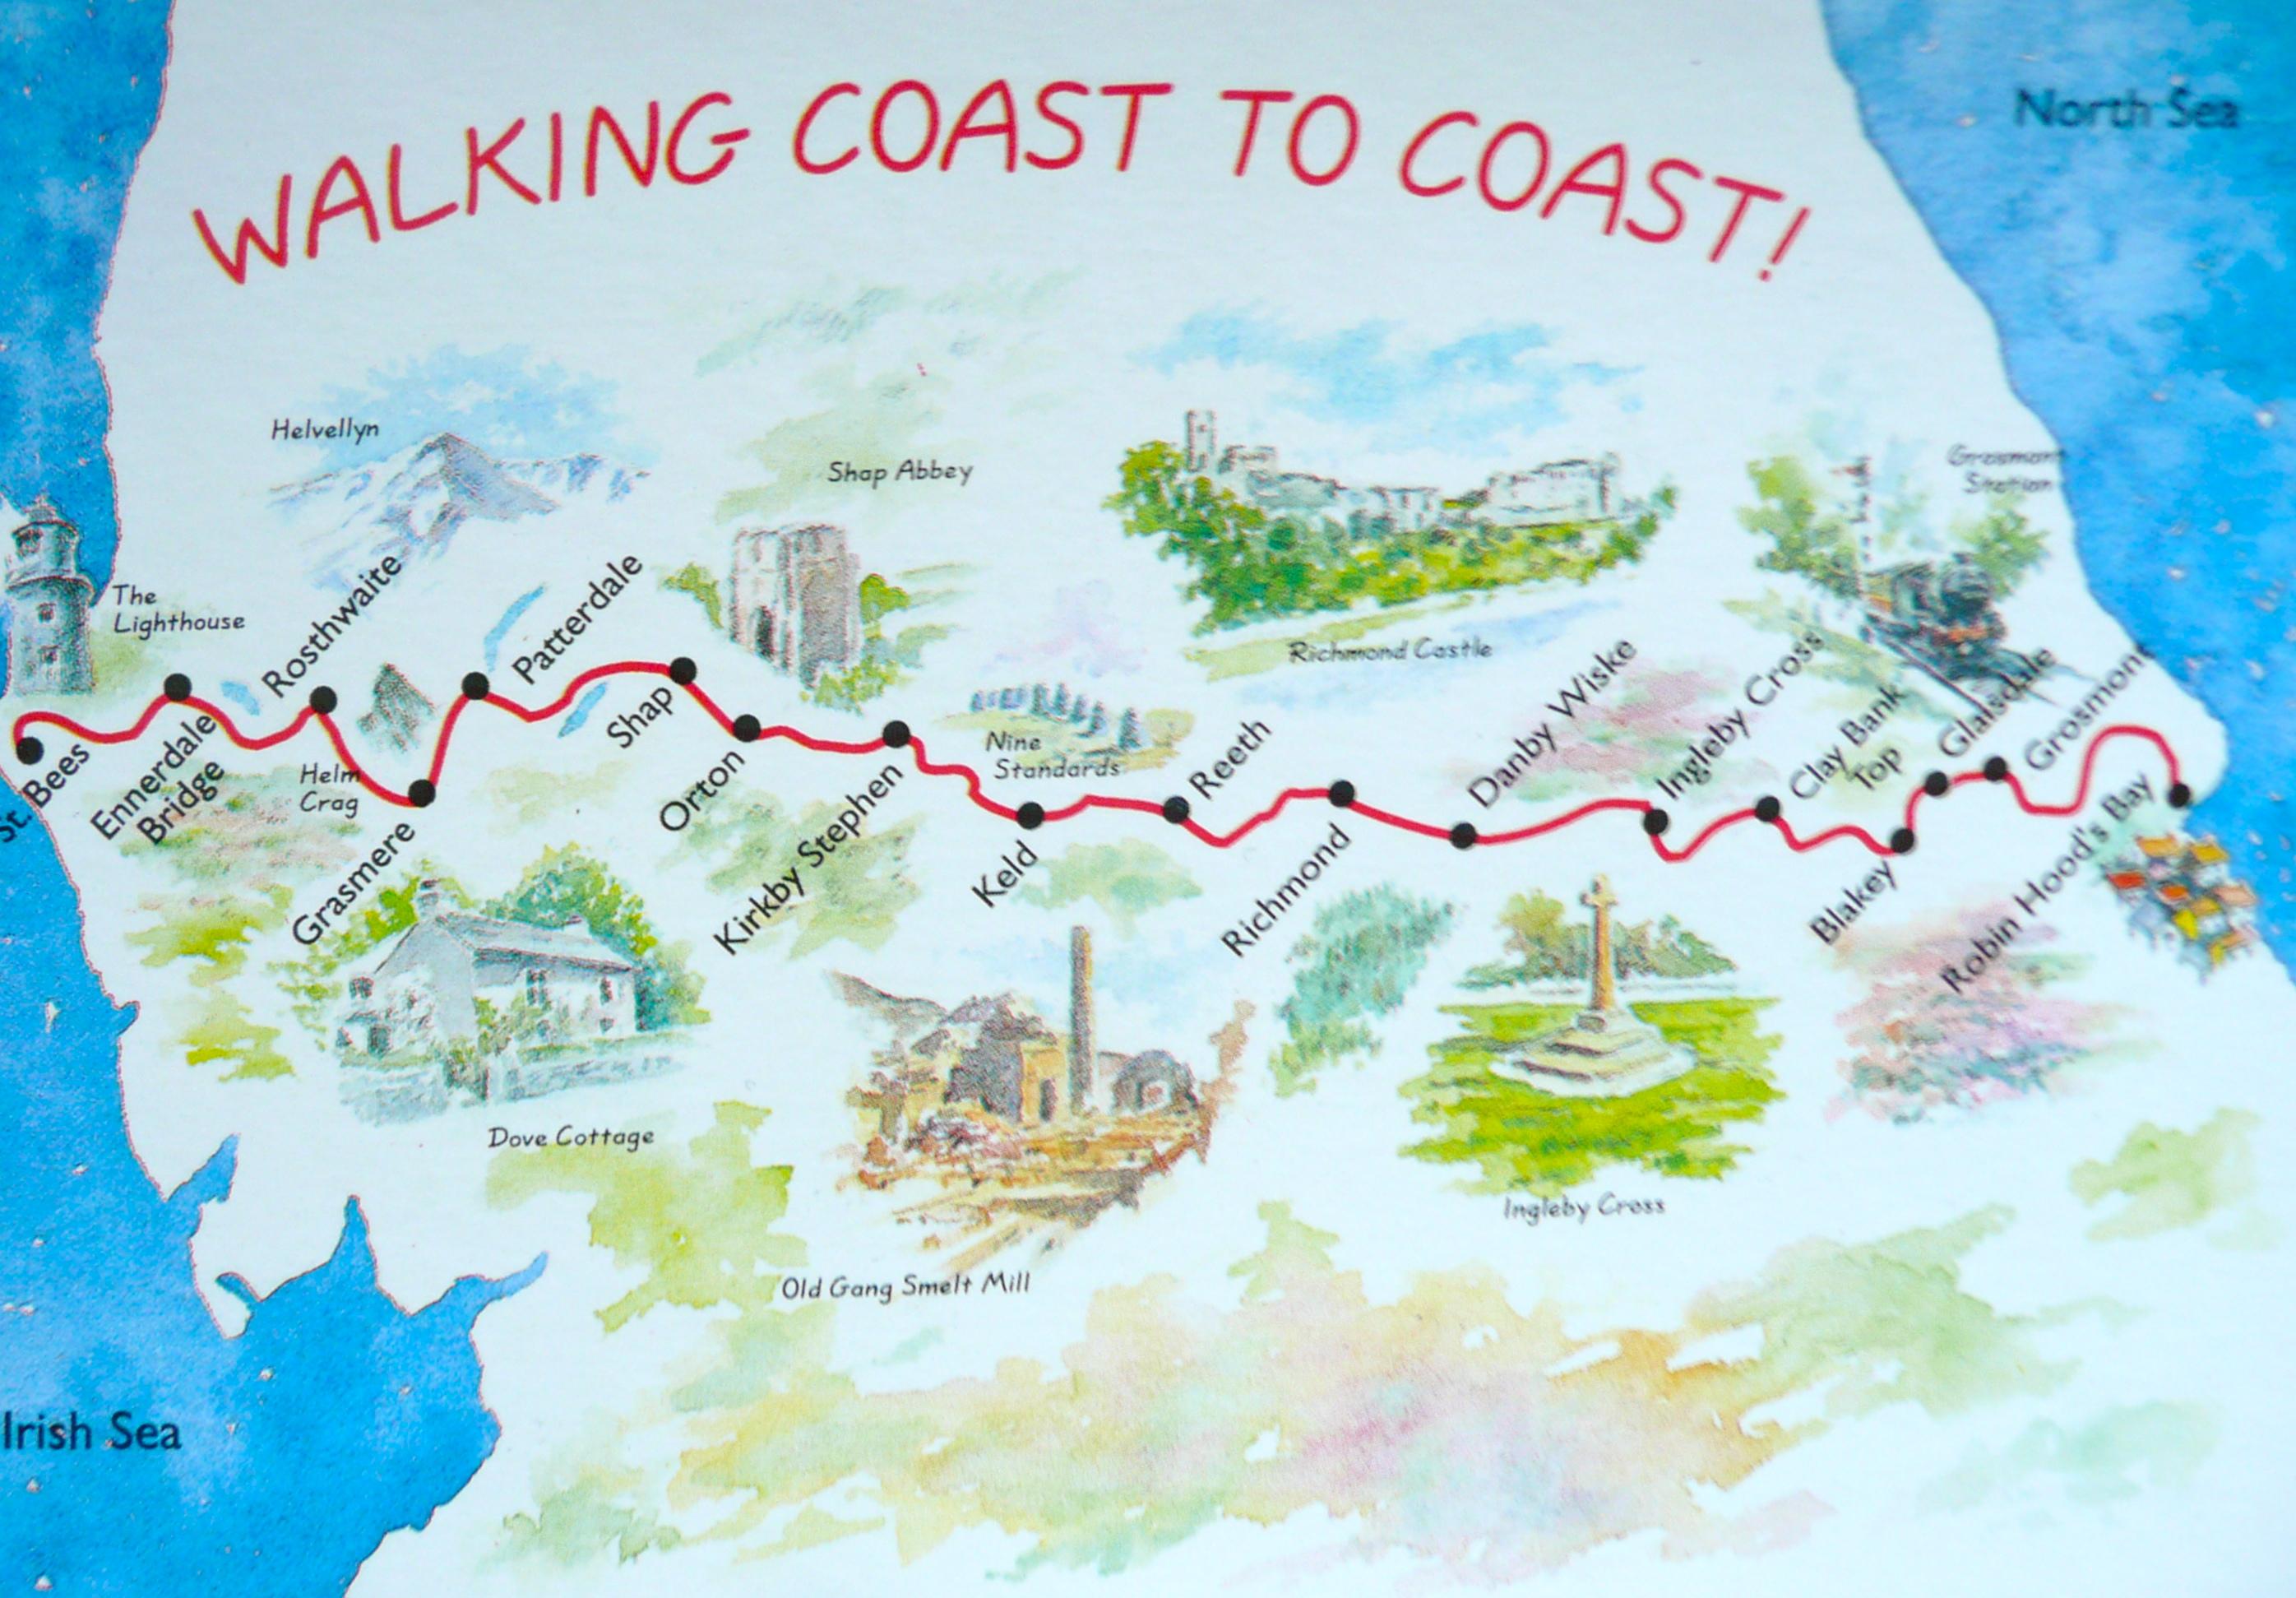 Walking Coast to Coast